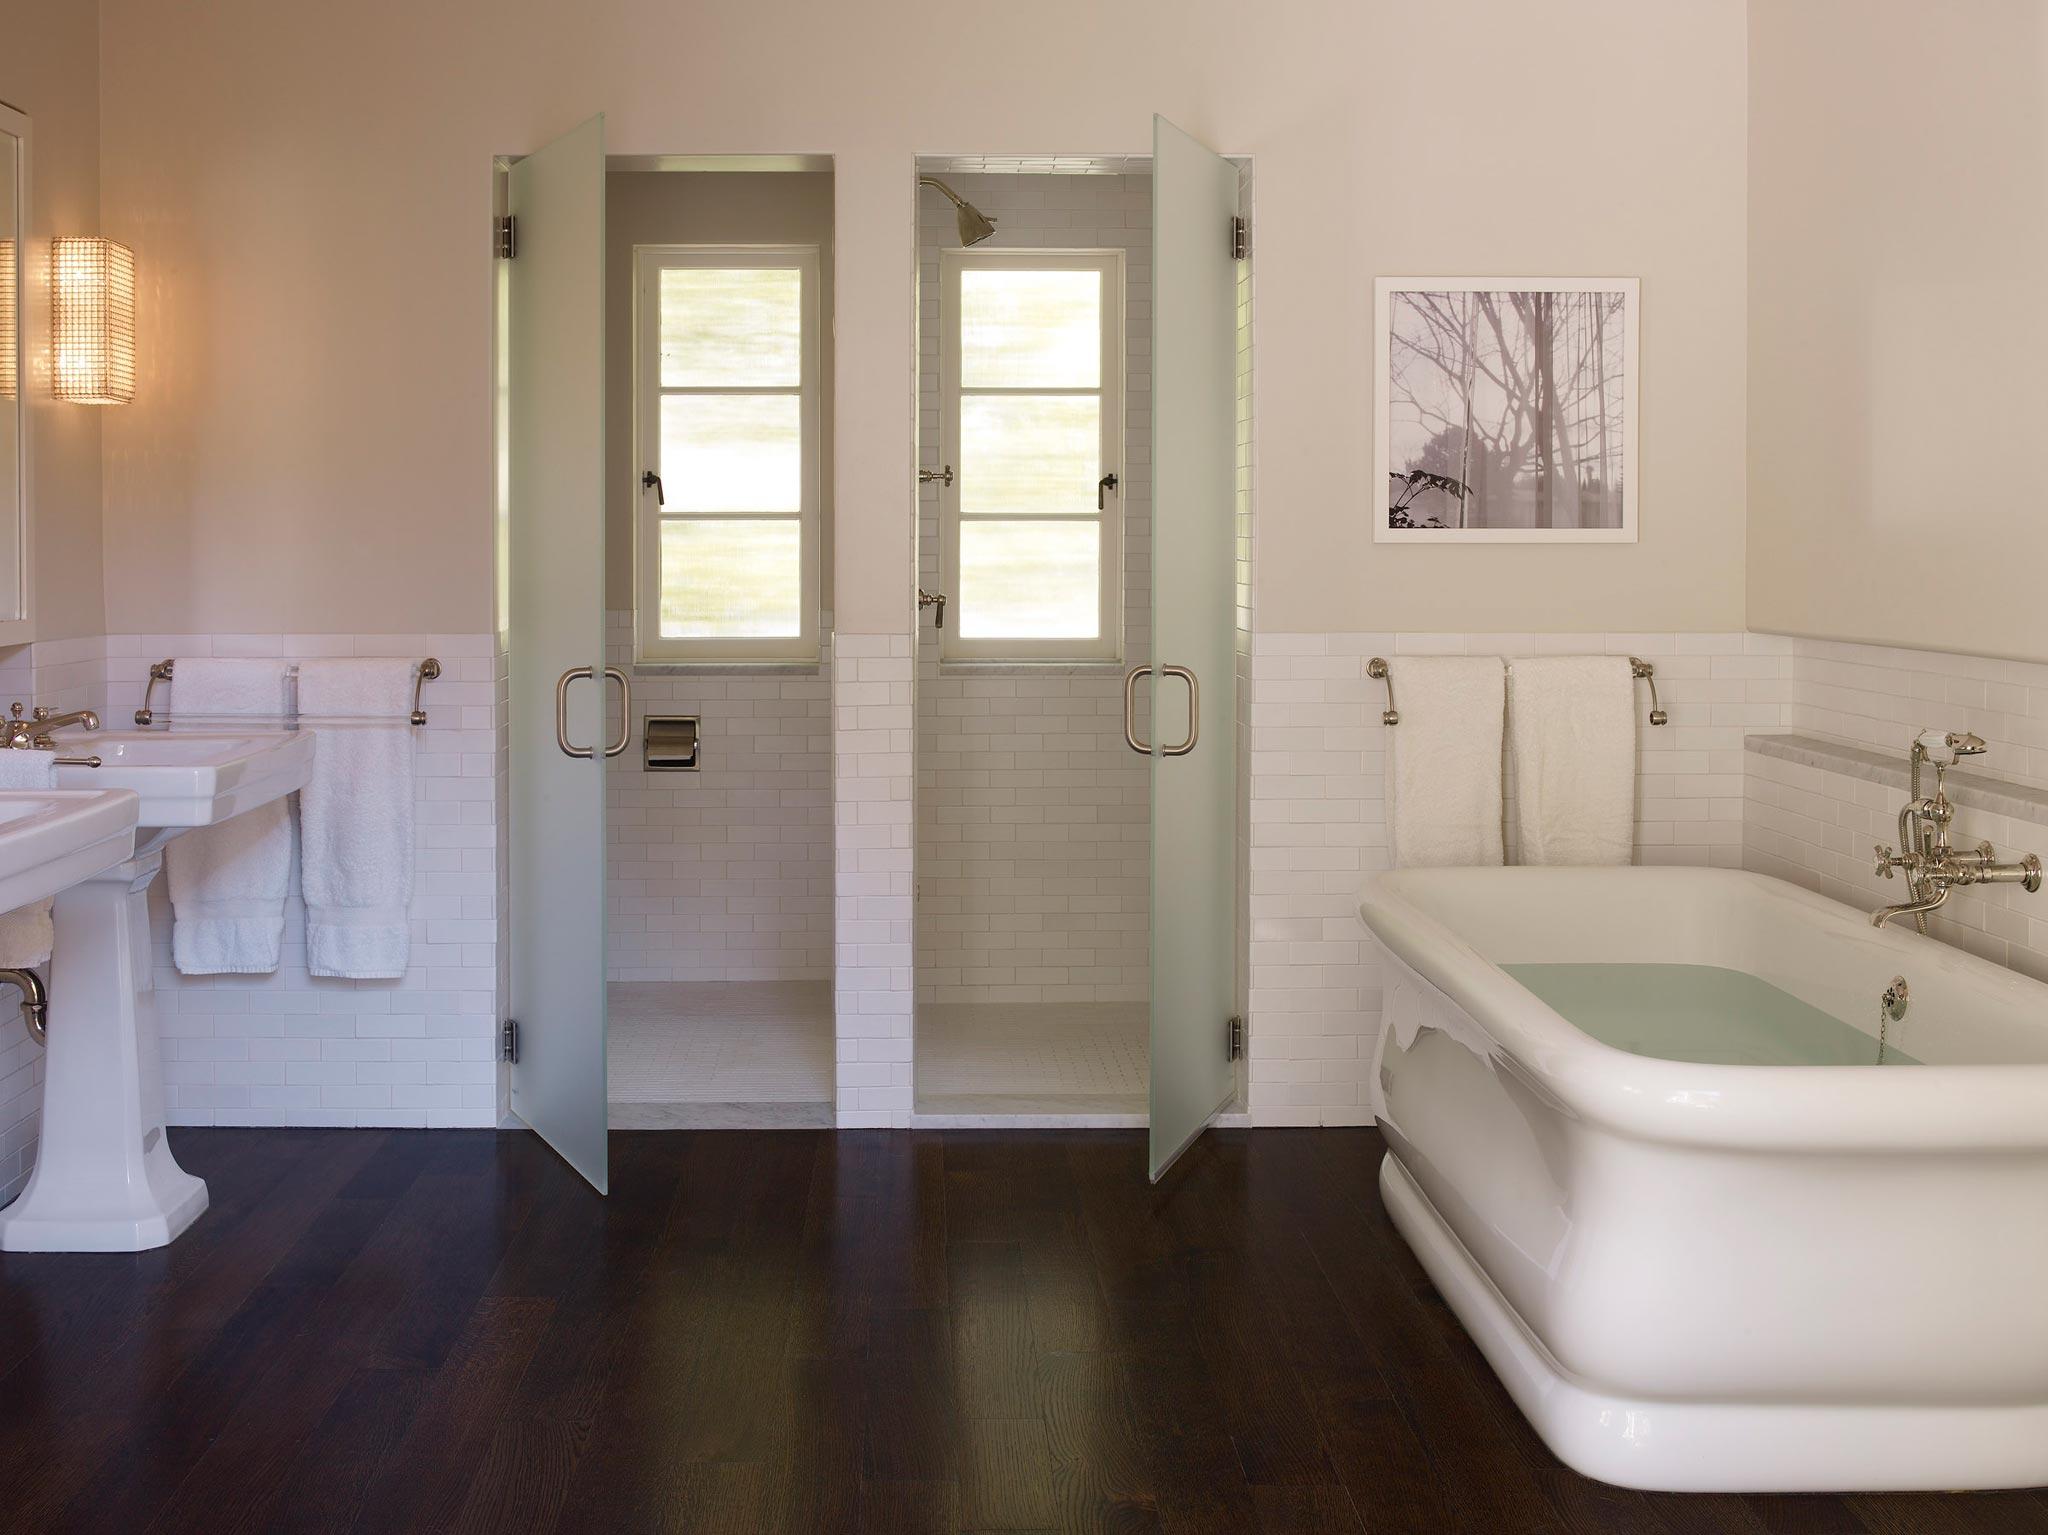 Claremont modern aesthetic pavillon house interior view of bathroom